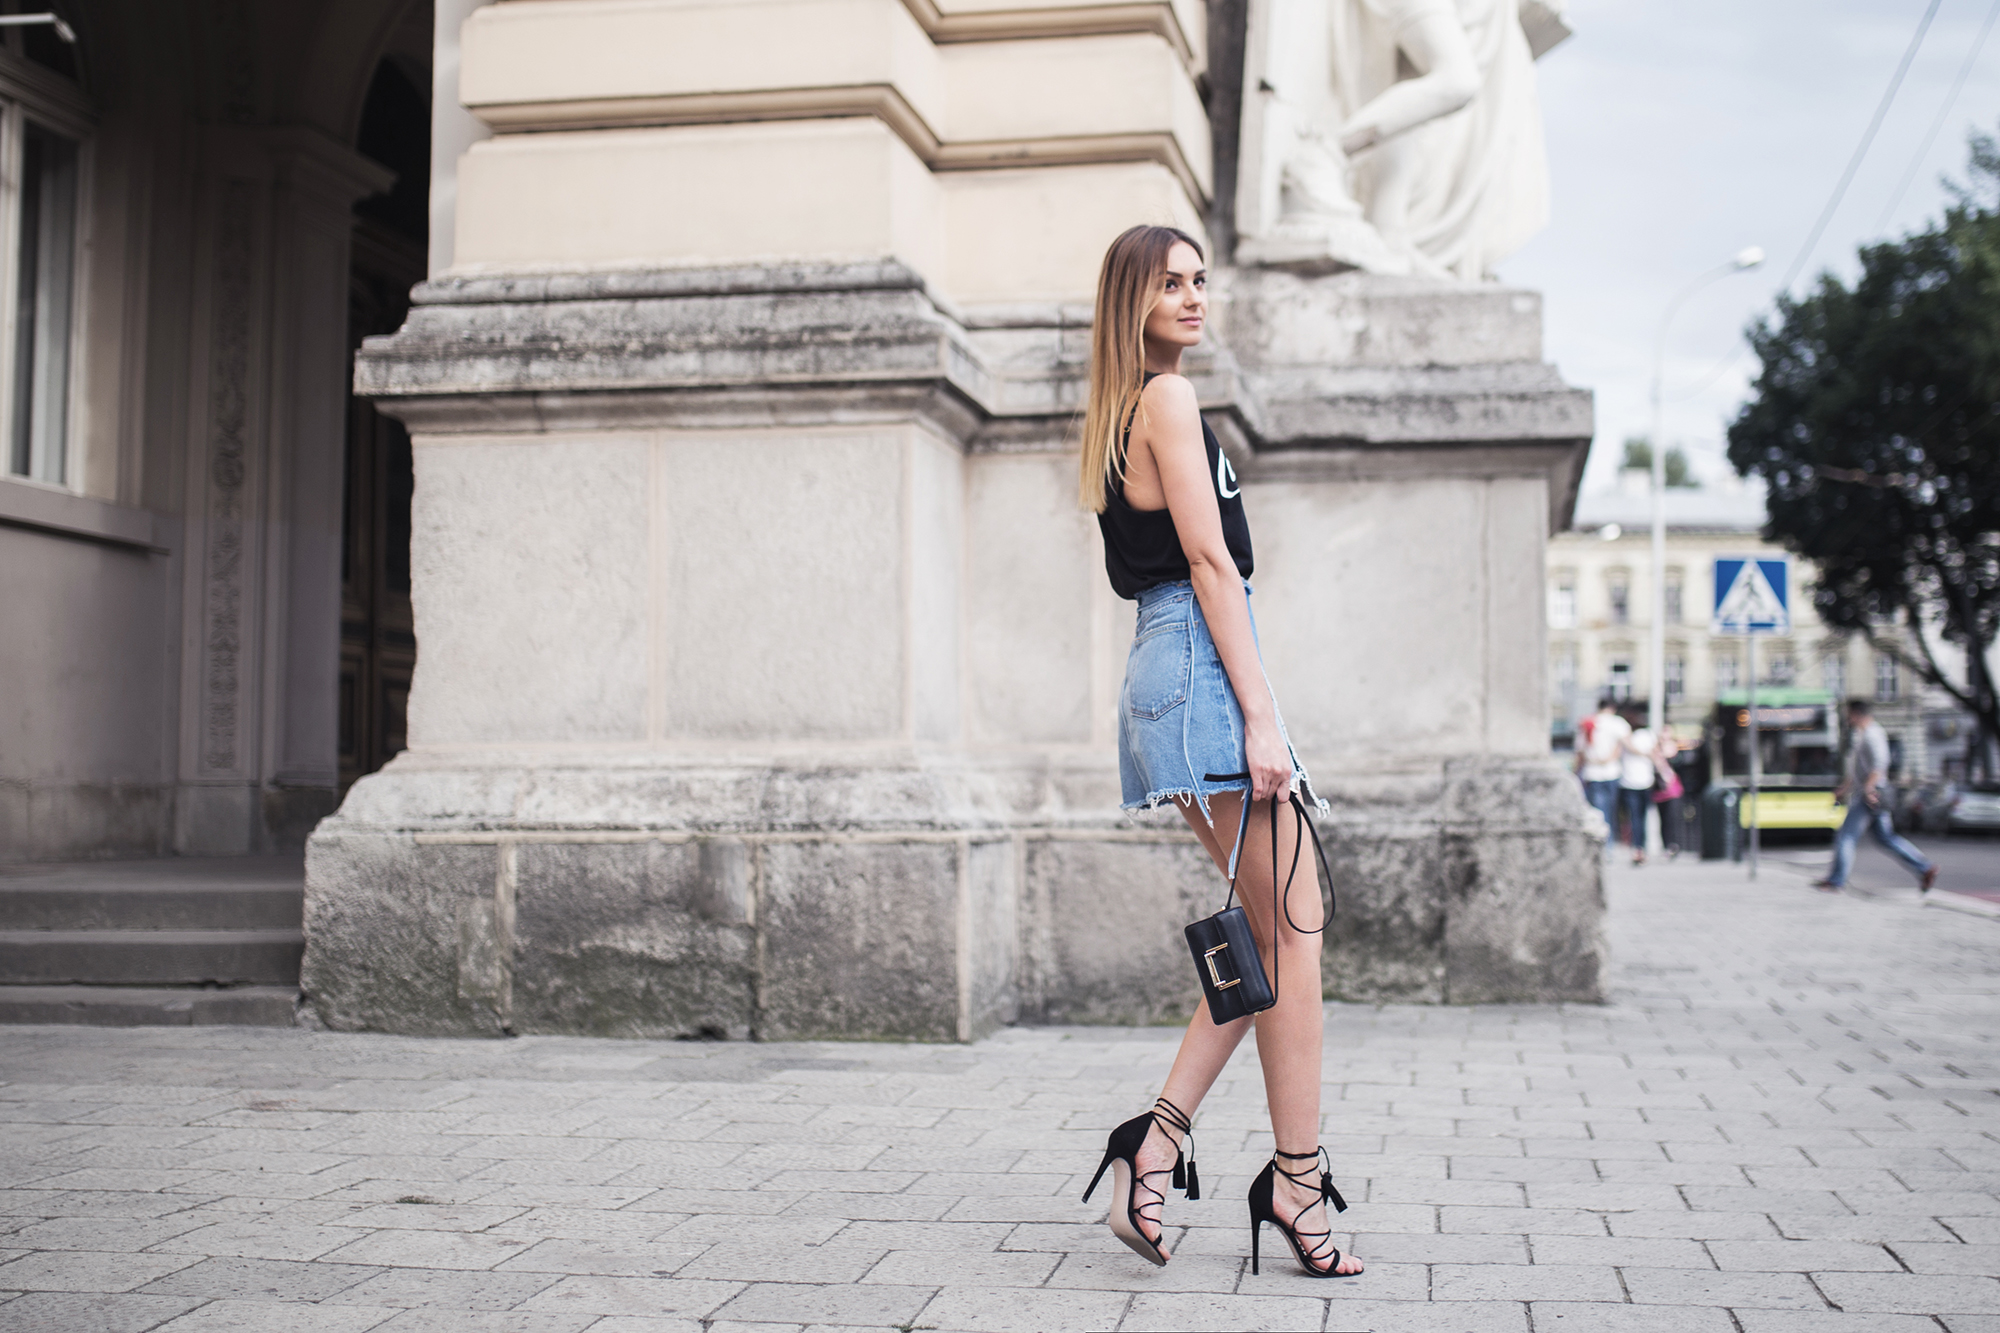 denim-skirt-wrap-heels-outfit-street-style